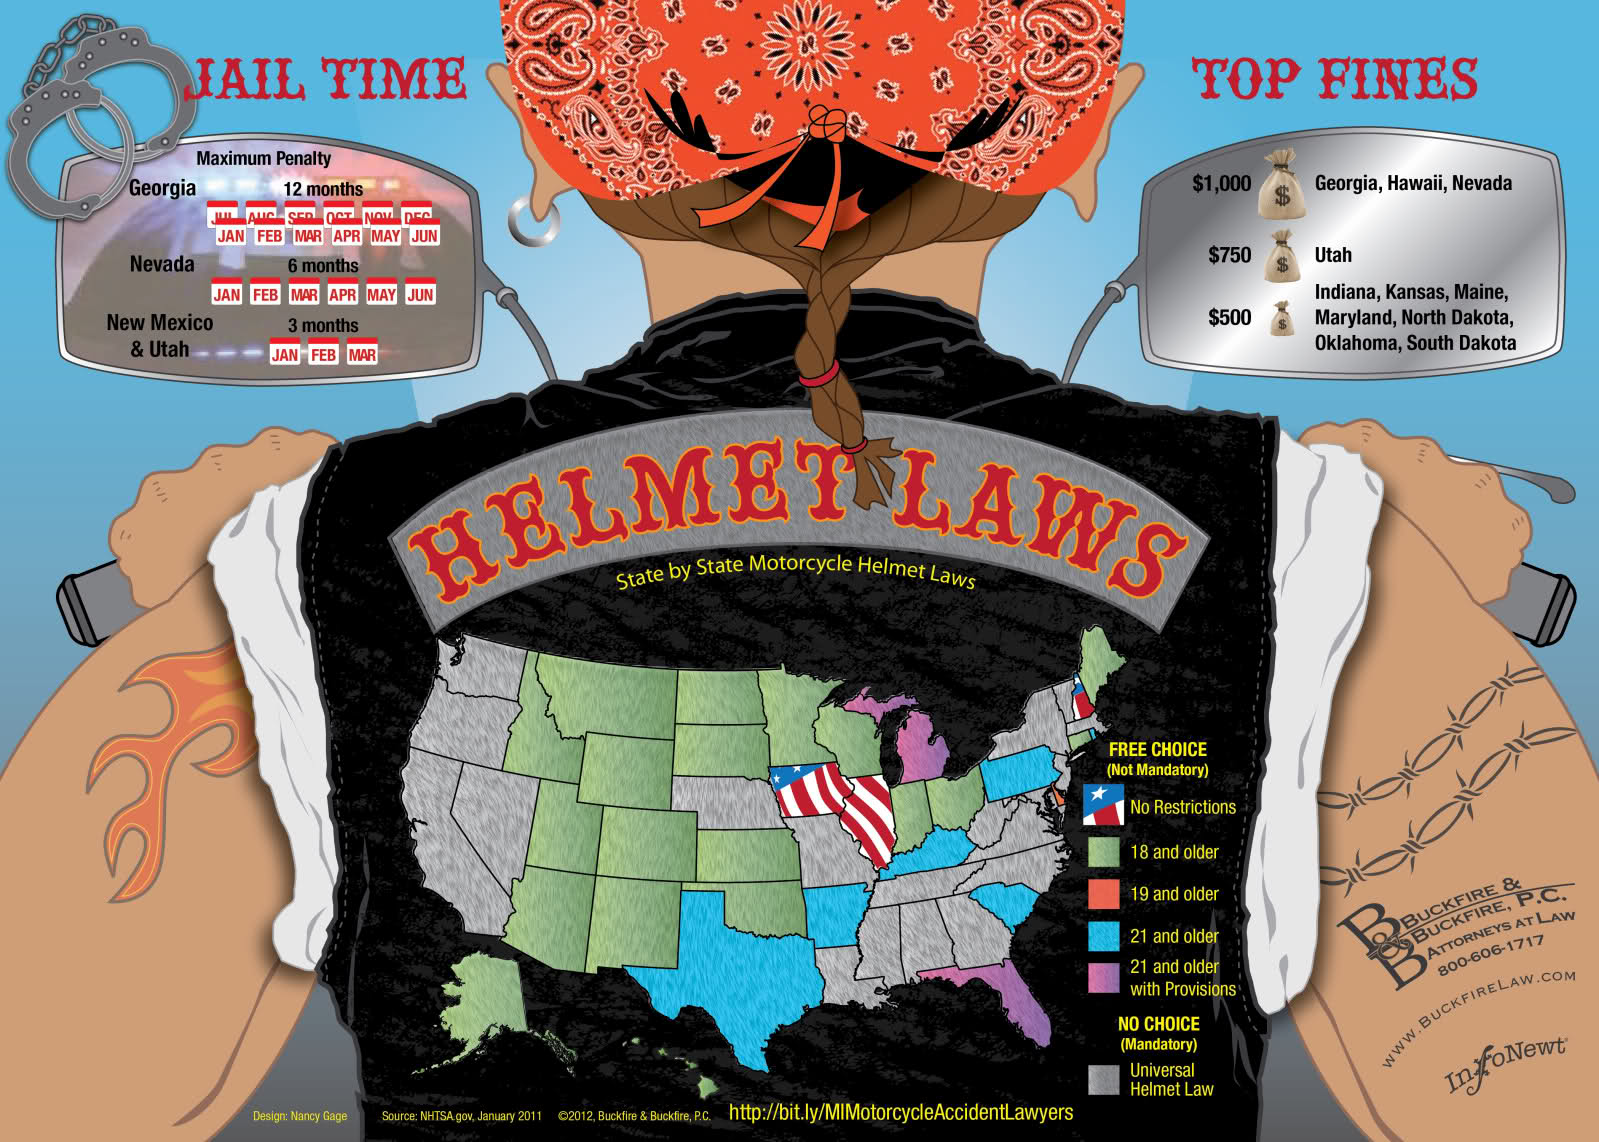 Helmet Laws [INFOGRAPHIC] - Infographic List